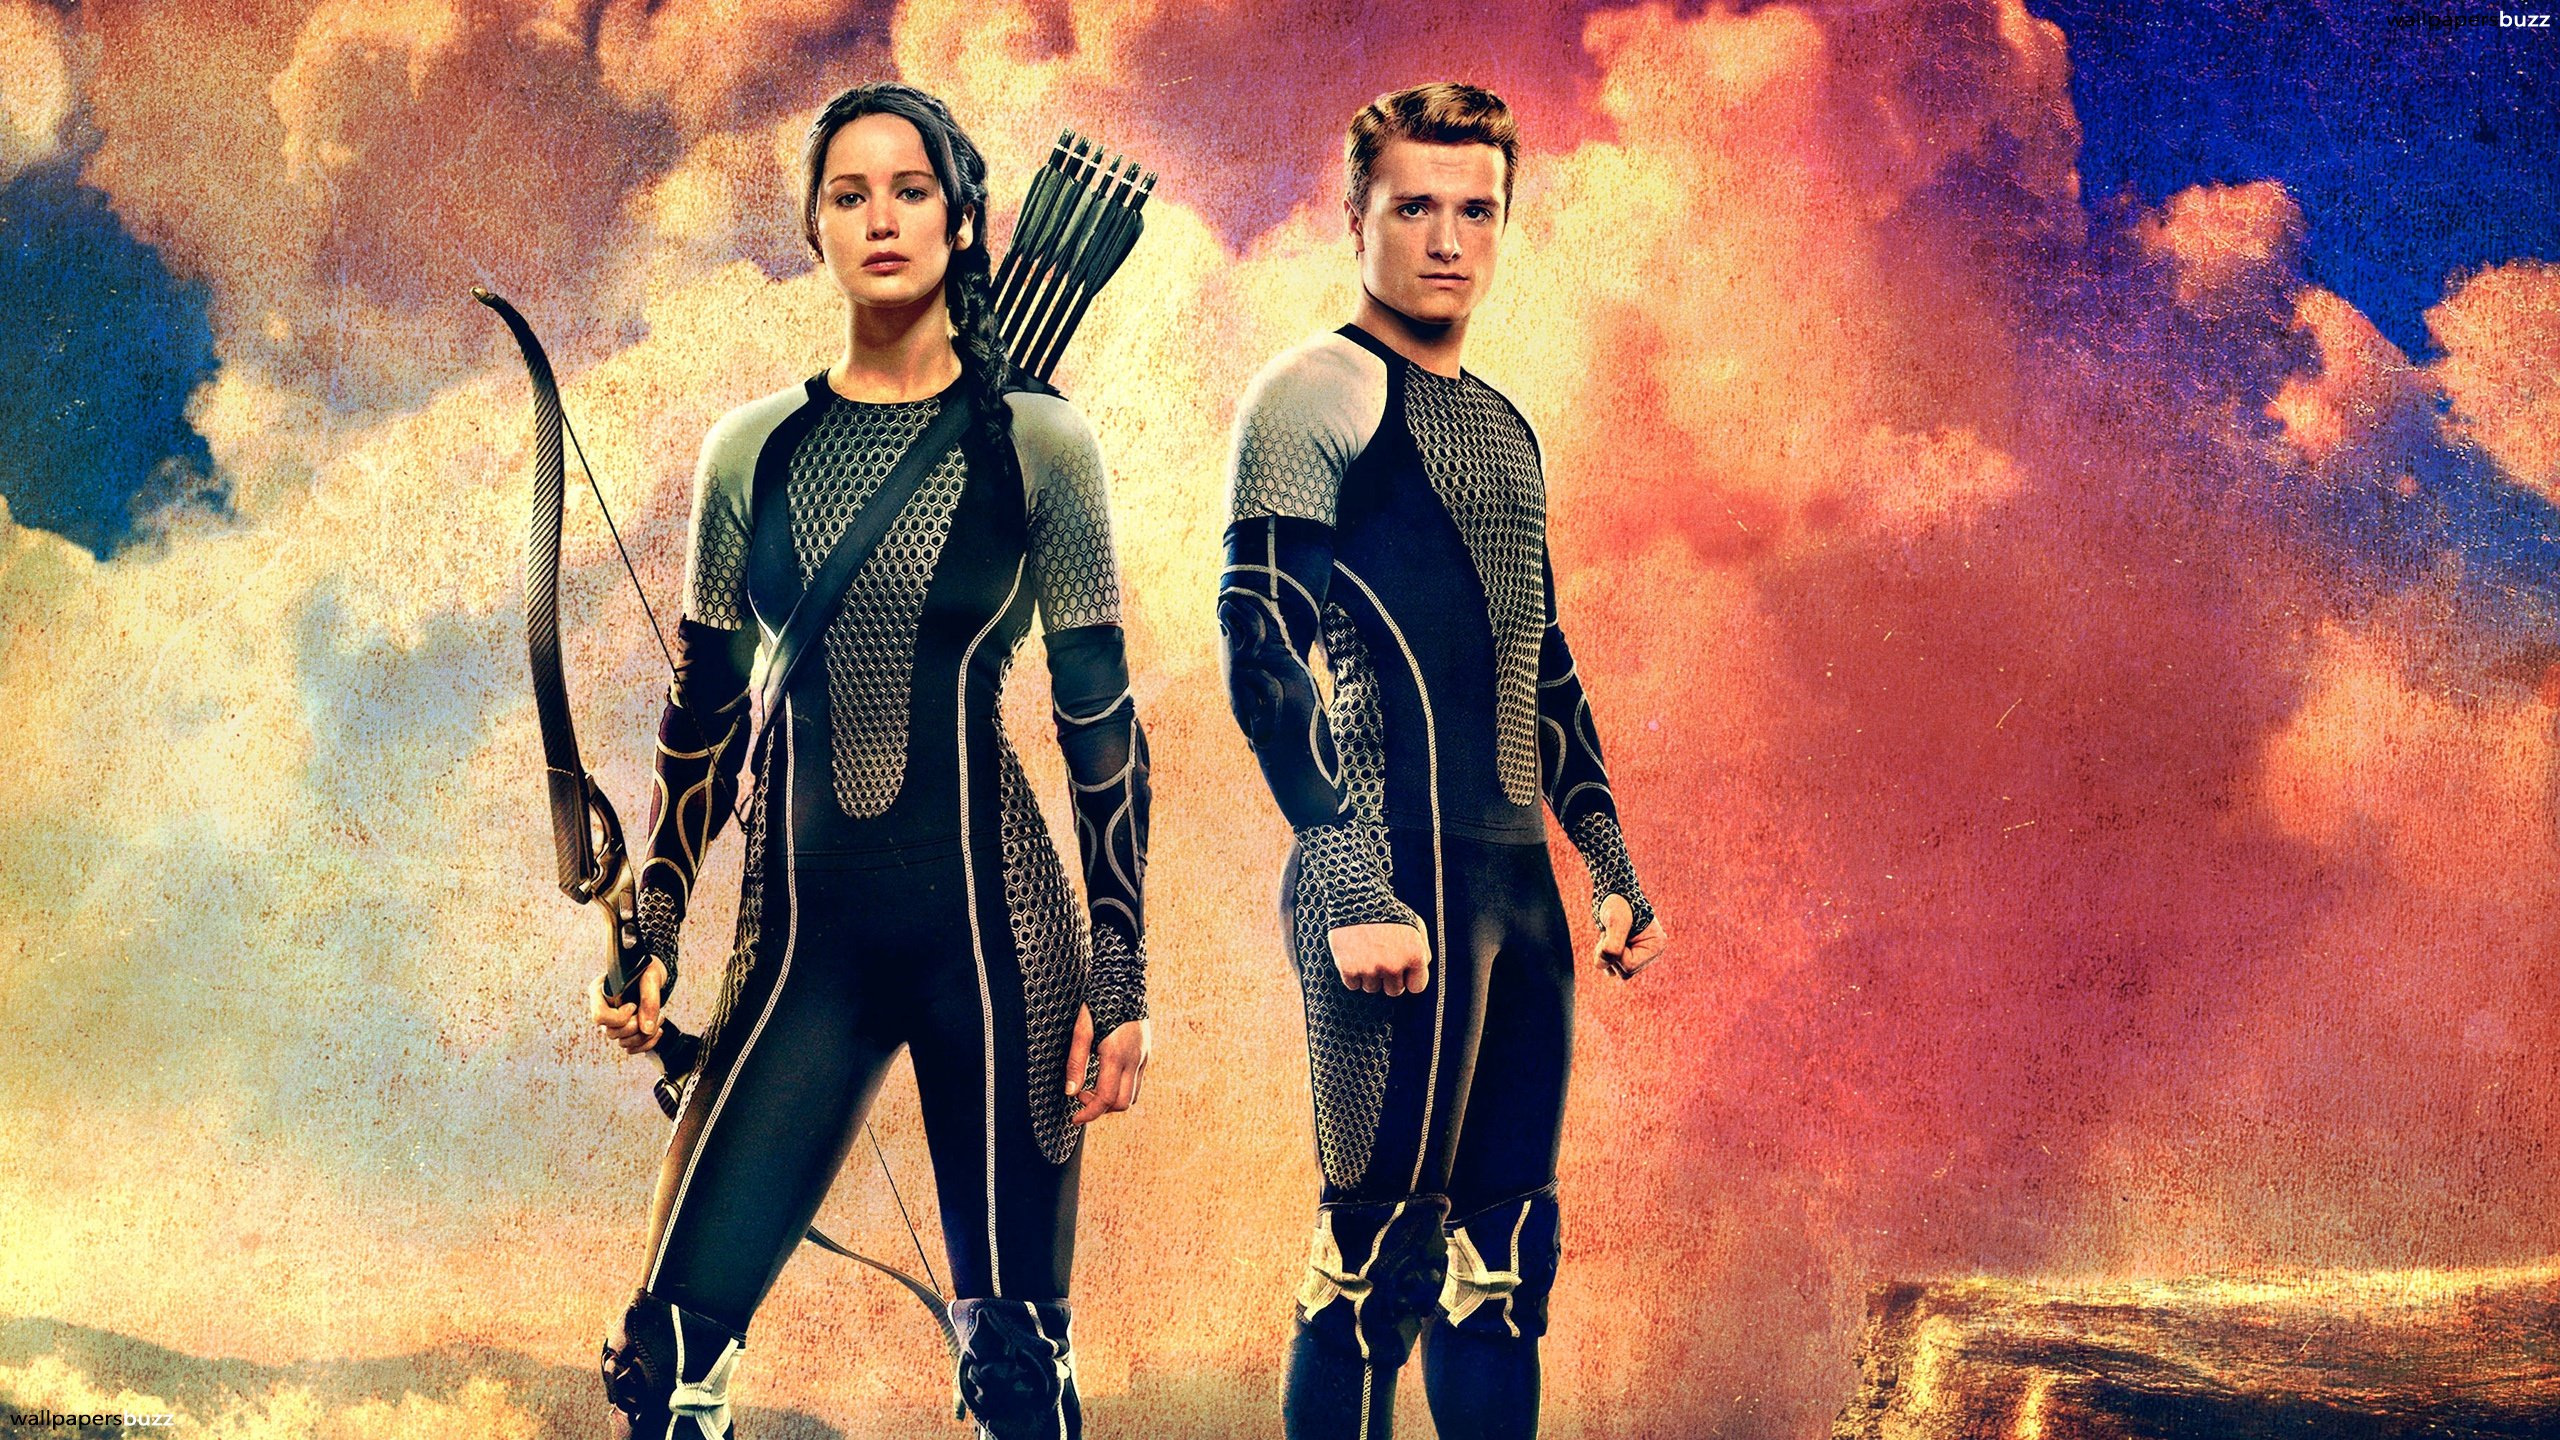 Katniss and Peeta before the fight HD Wallpaper 2560x1440